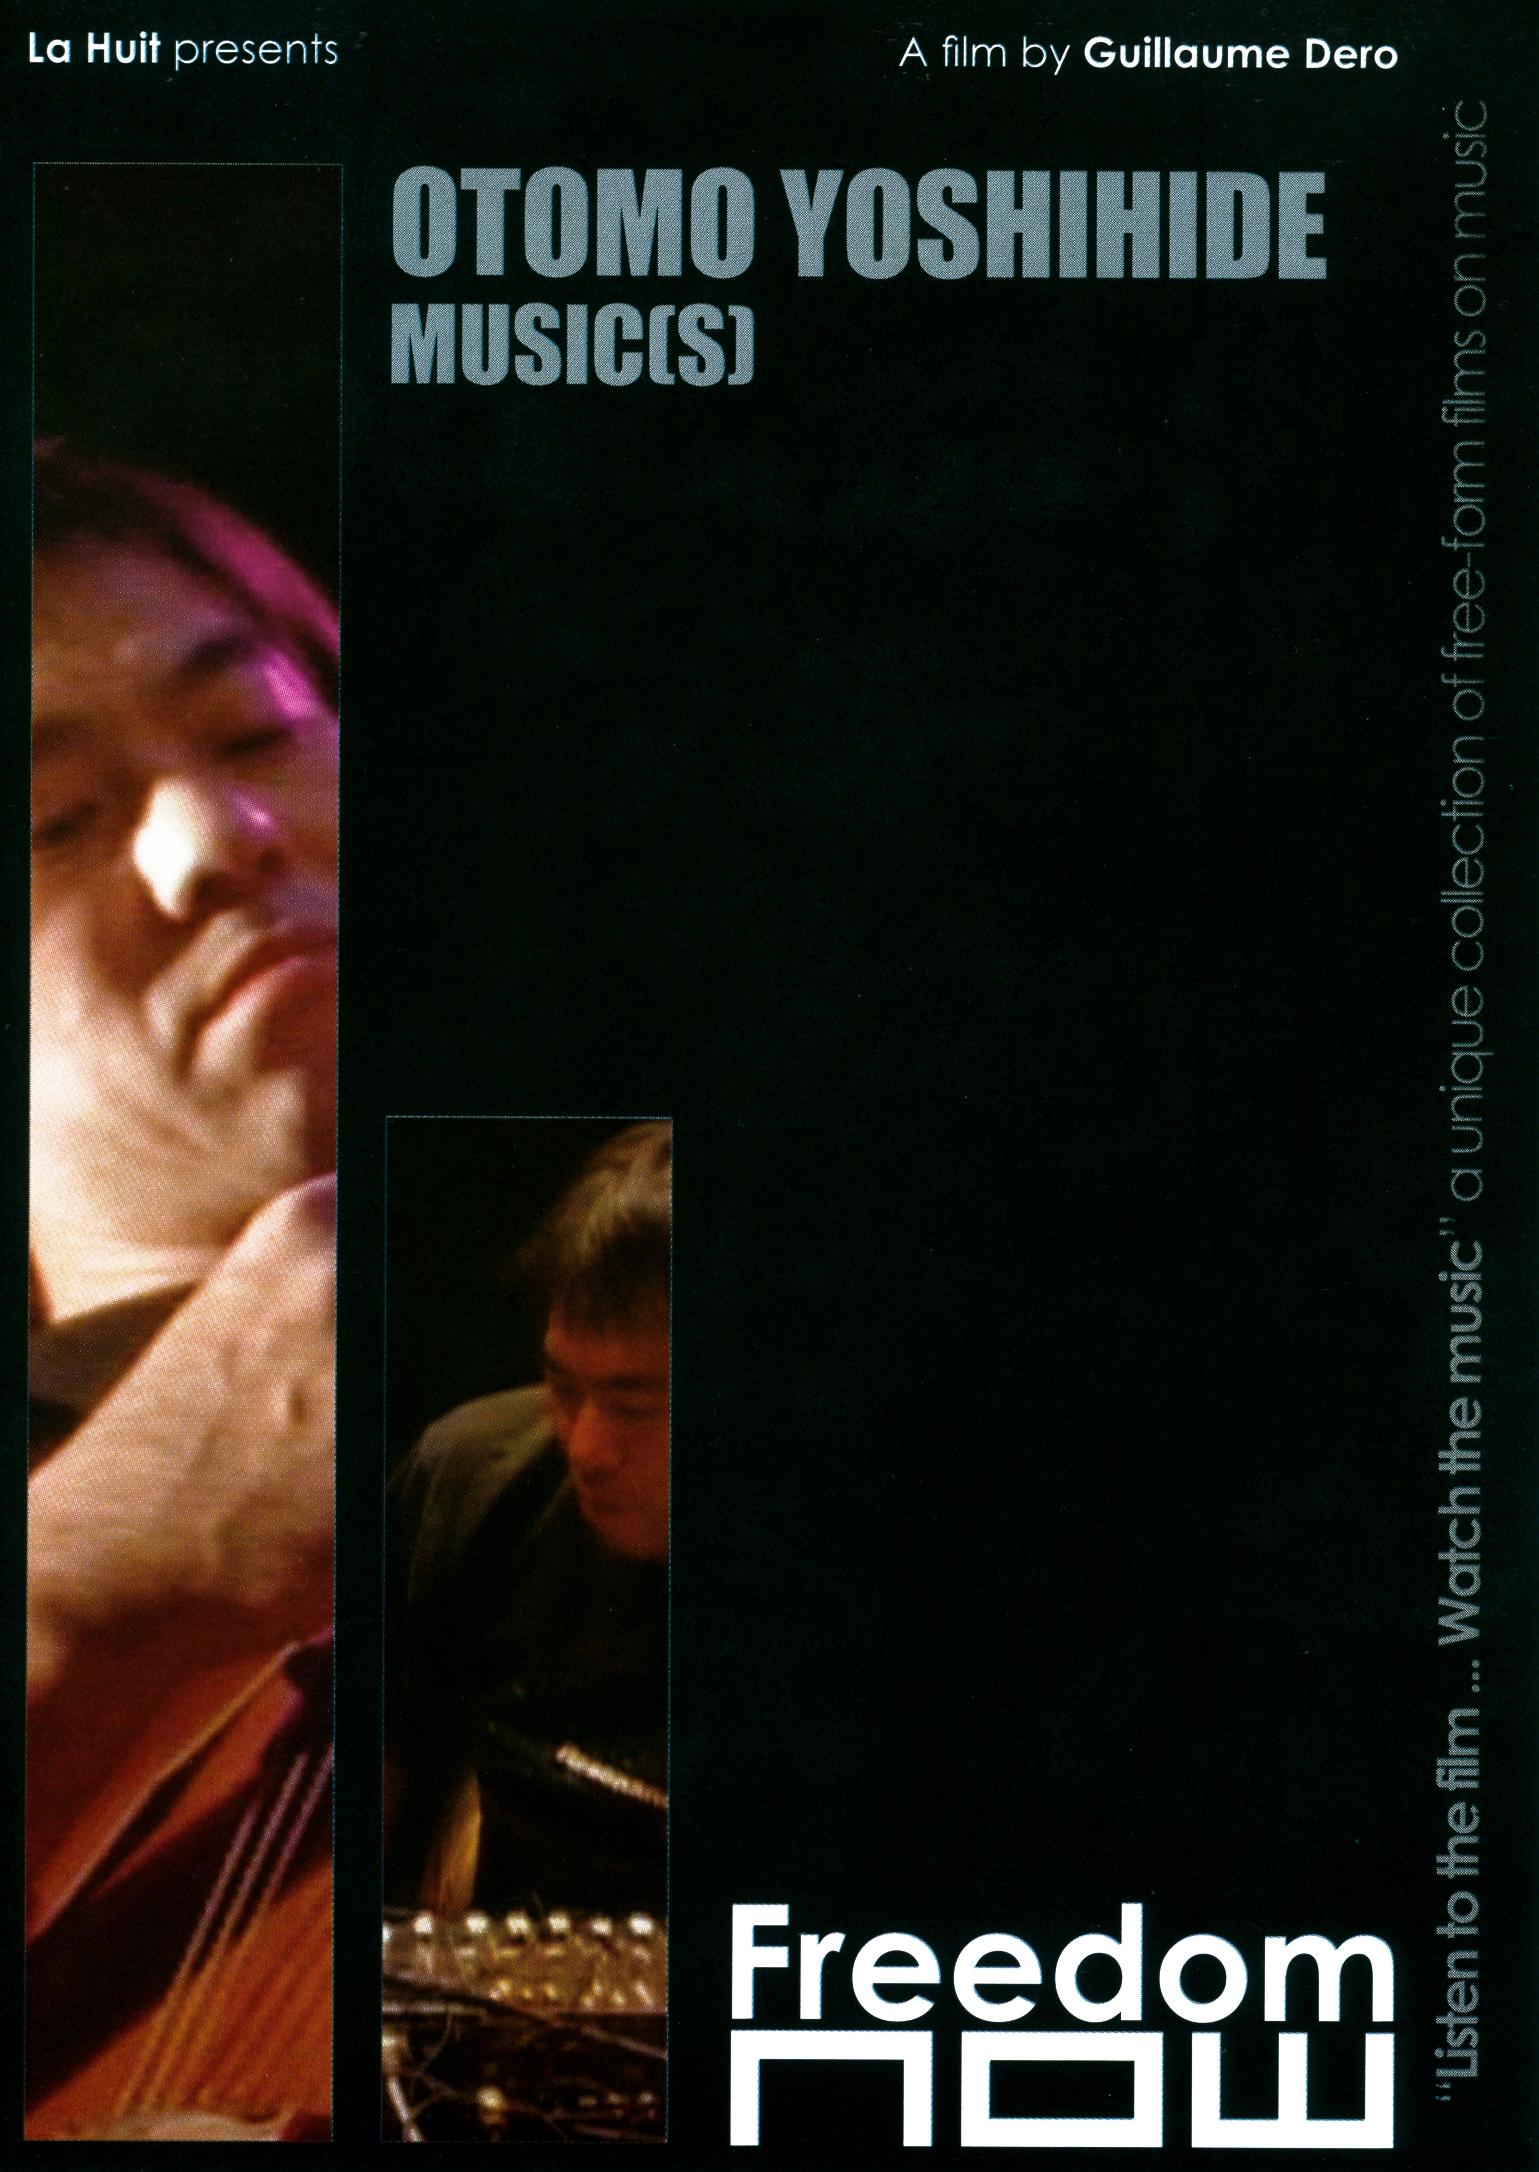 Otomo Yoshihide: Music(s)